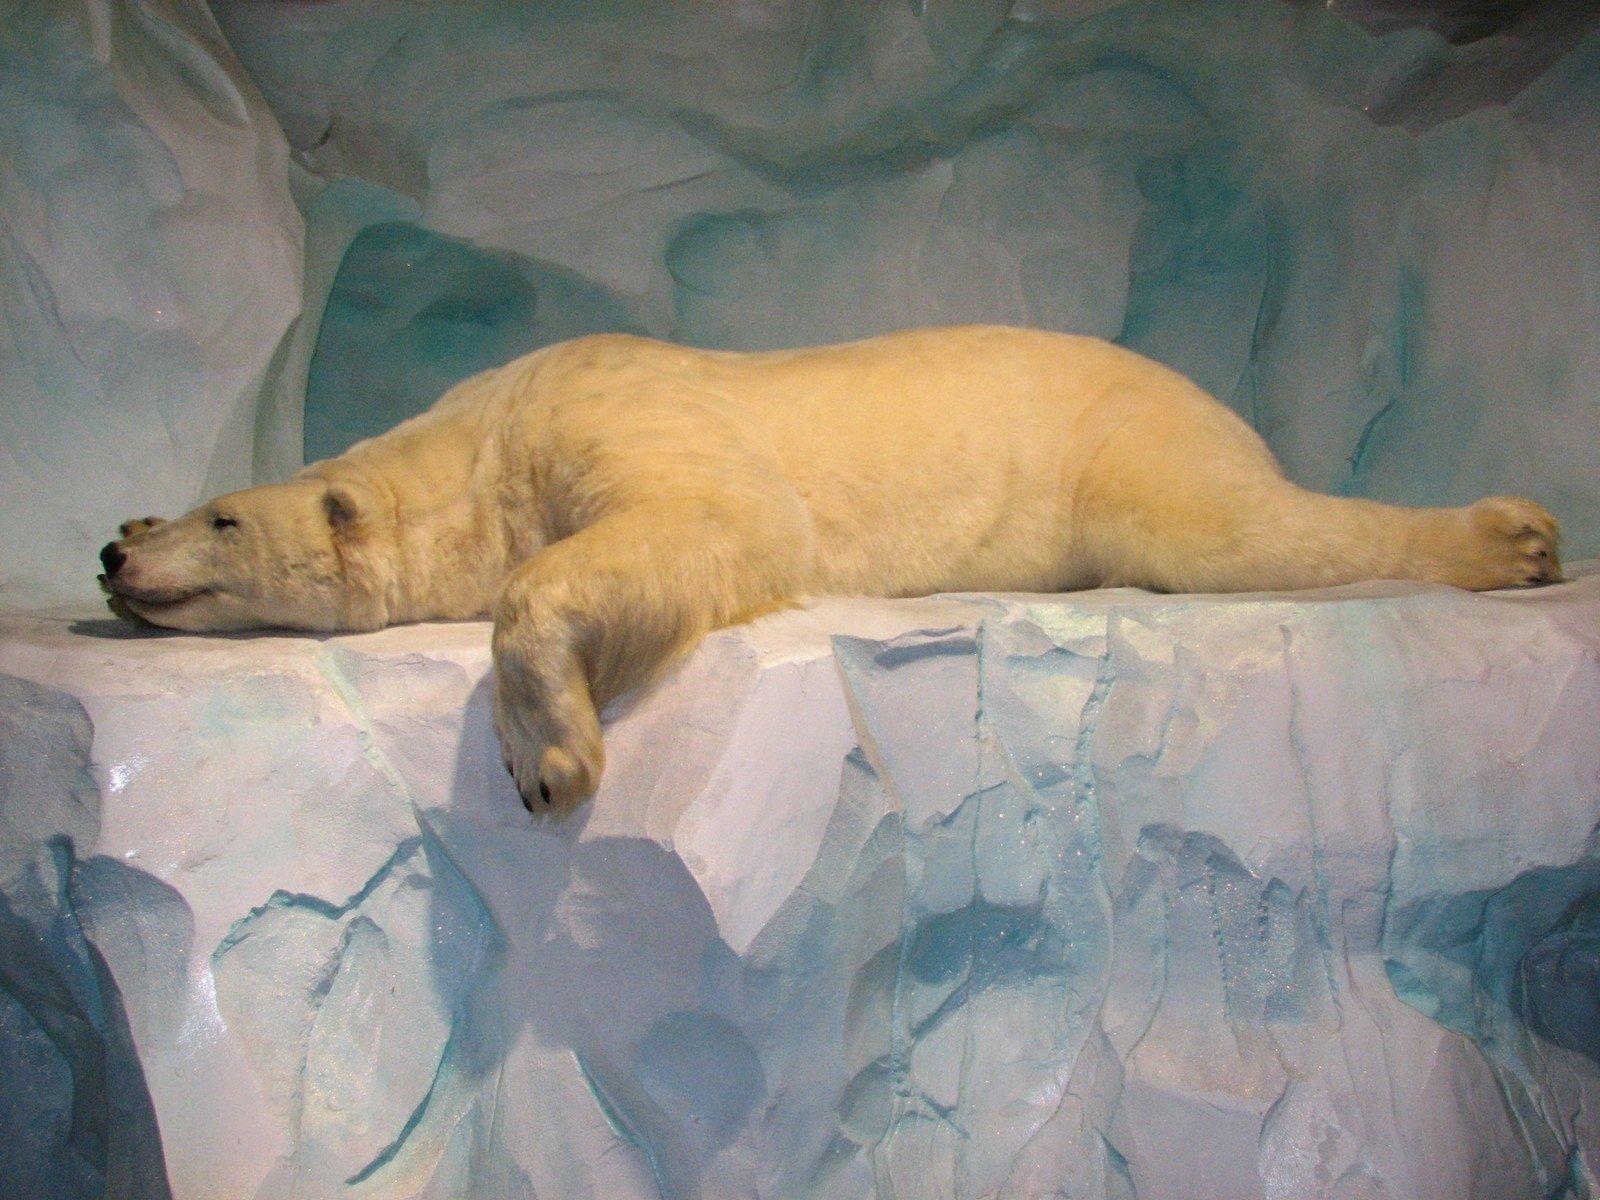 polar bear and climate change evidence